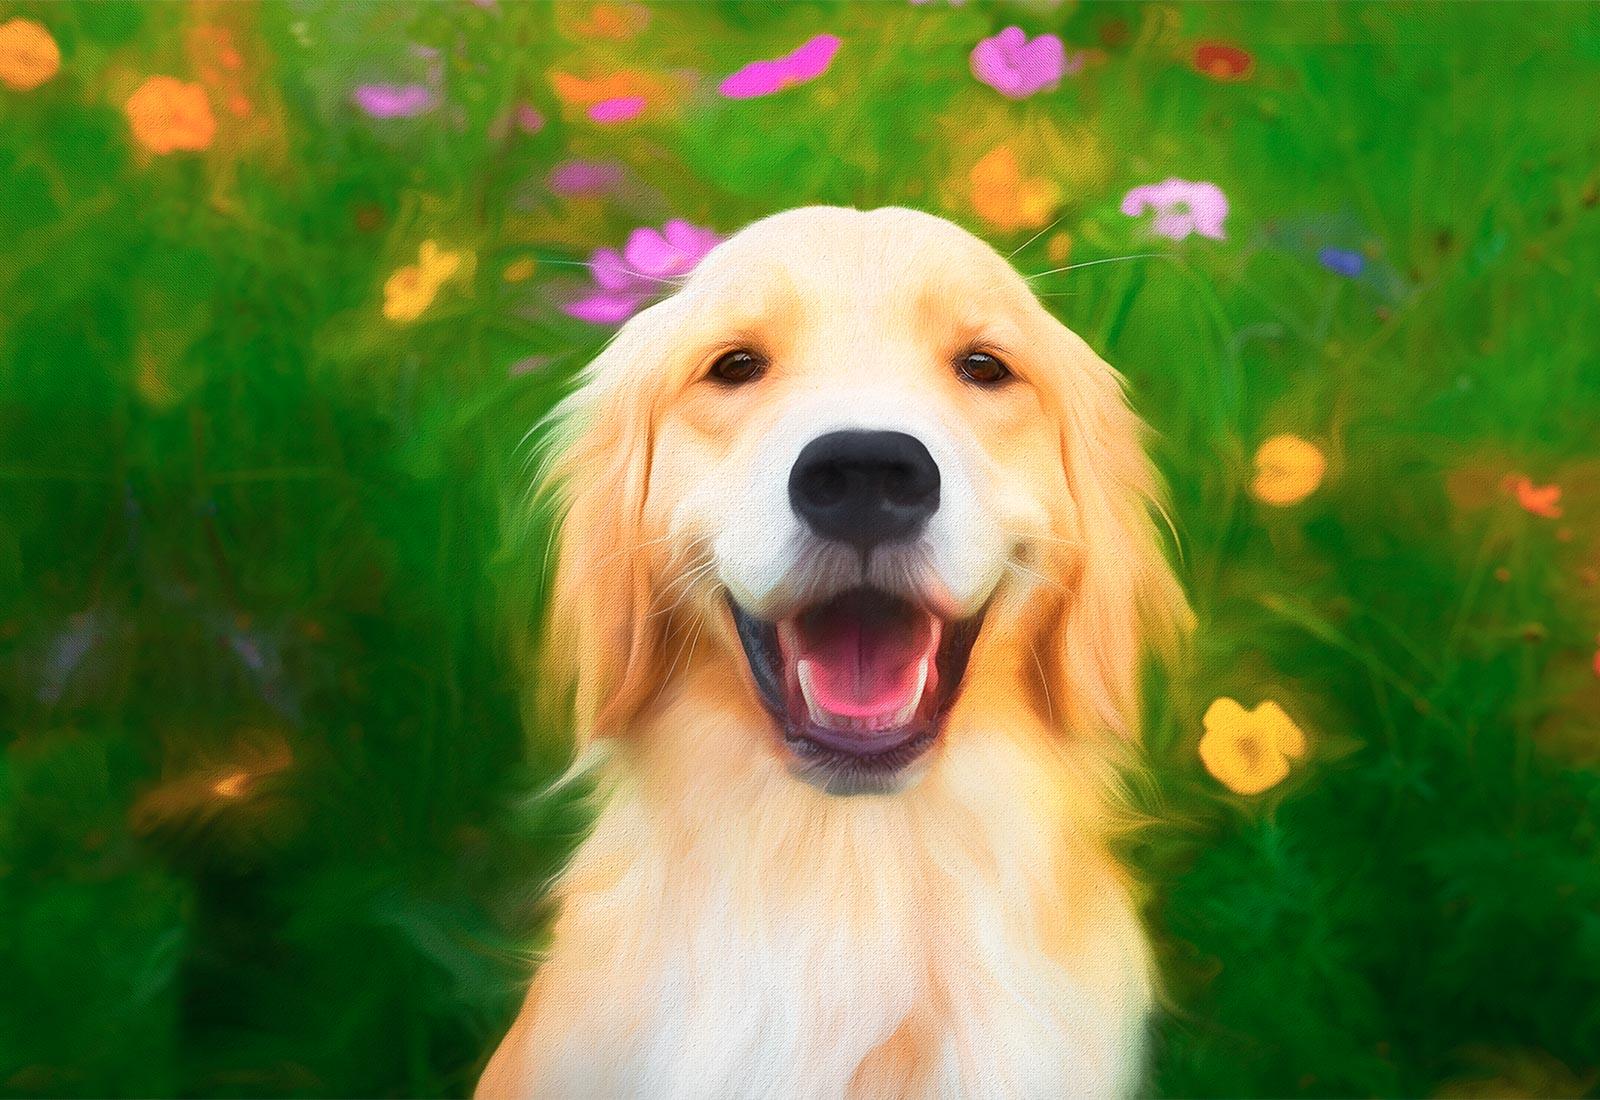 Golden Retriever smiling in the flowers